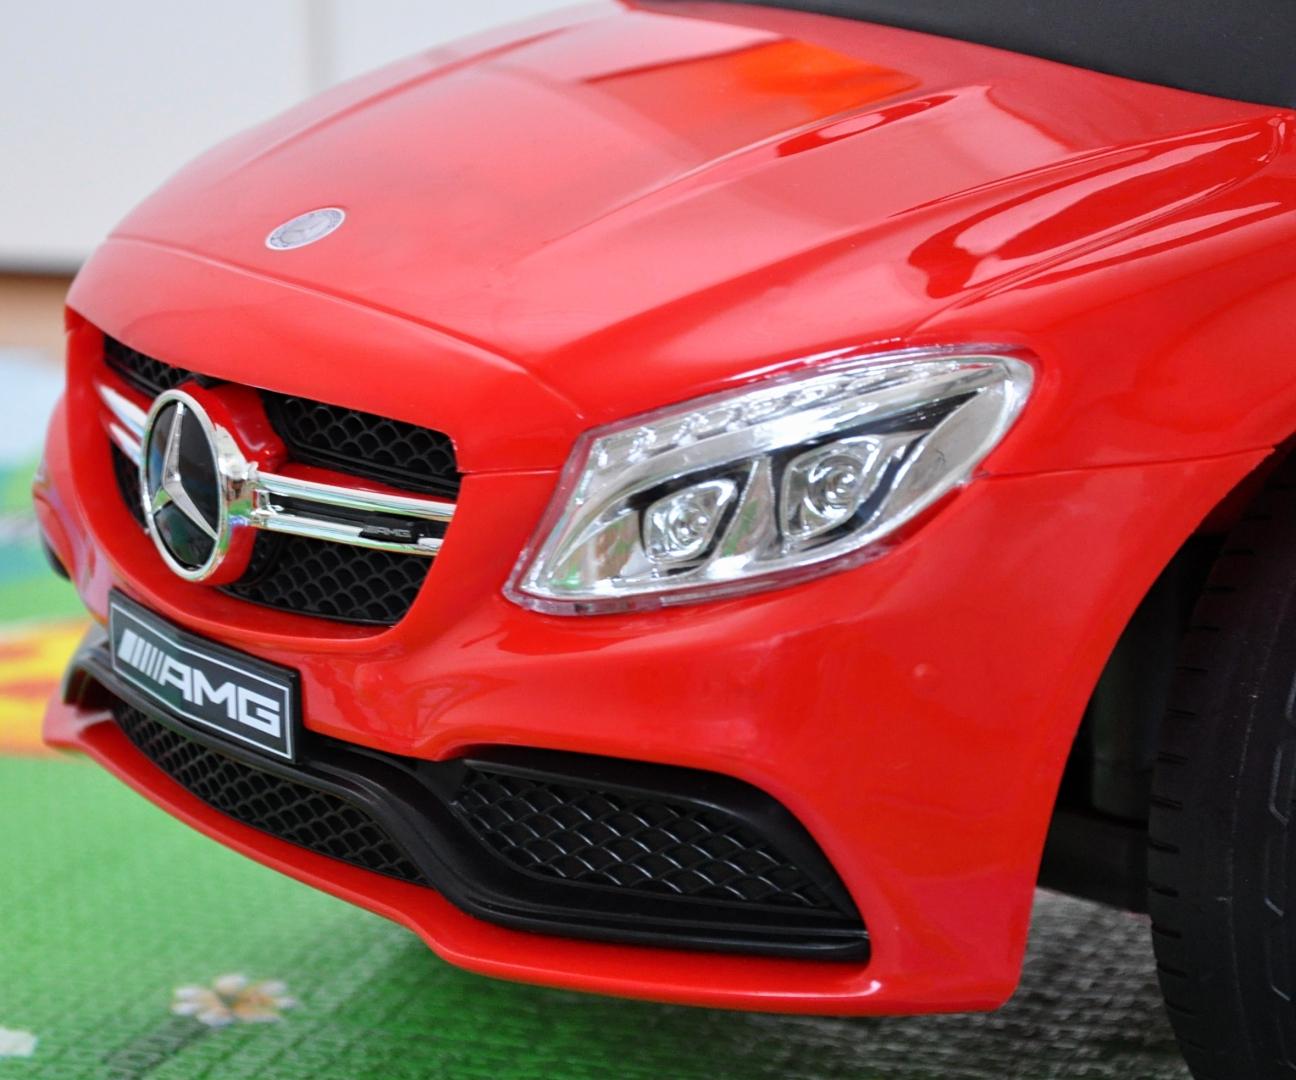 Pealeistutav auto MERCEDES-AMG C63 Coupe Red S